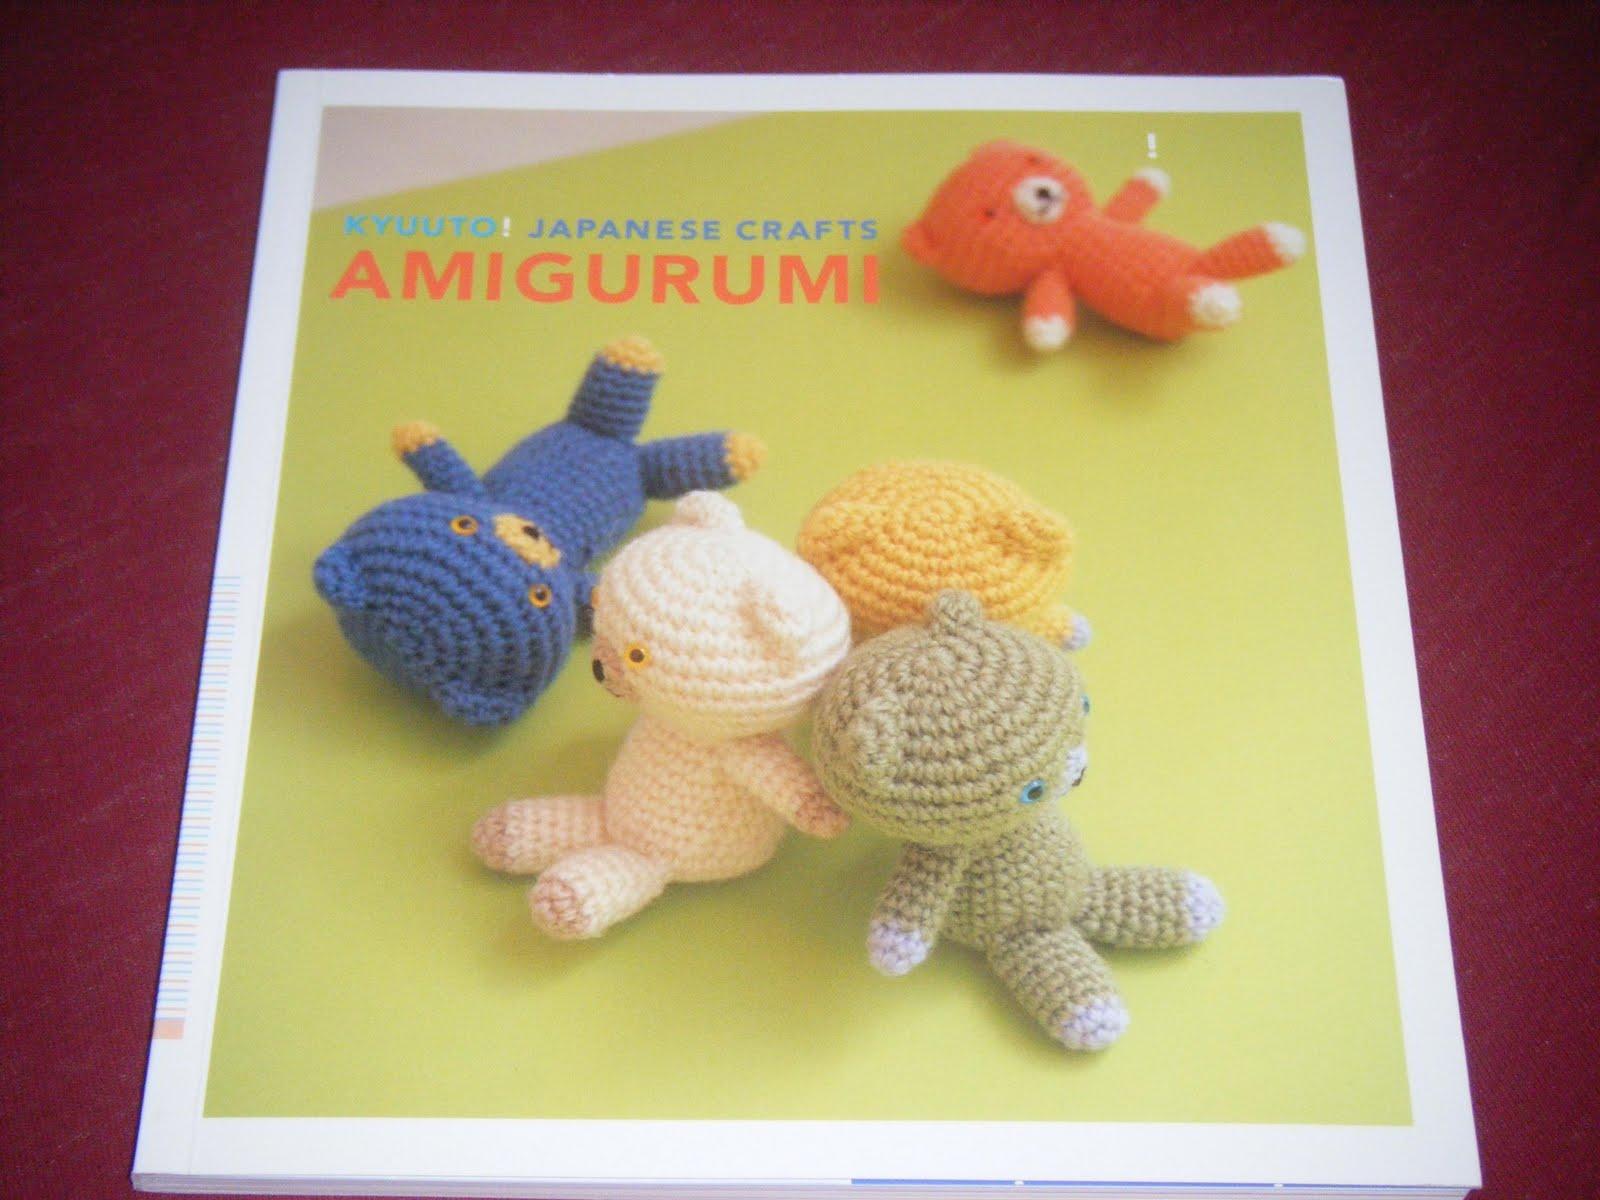 Kyuuto! Japanese crafts: Amigurumi